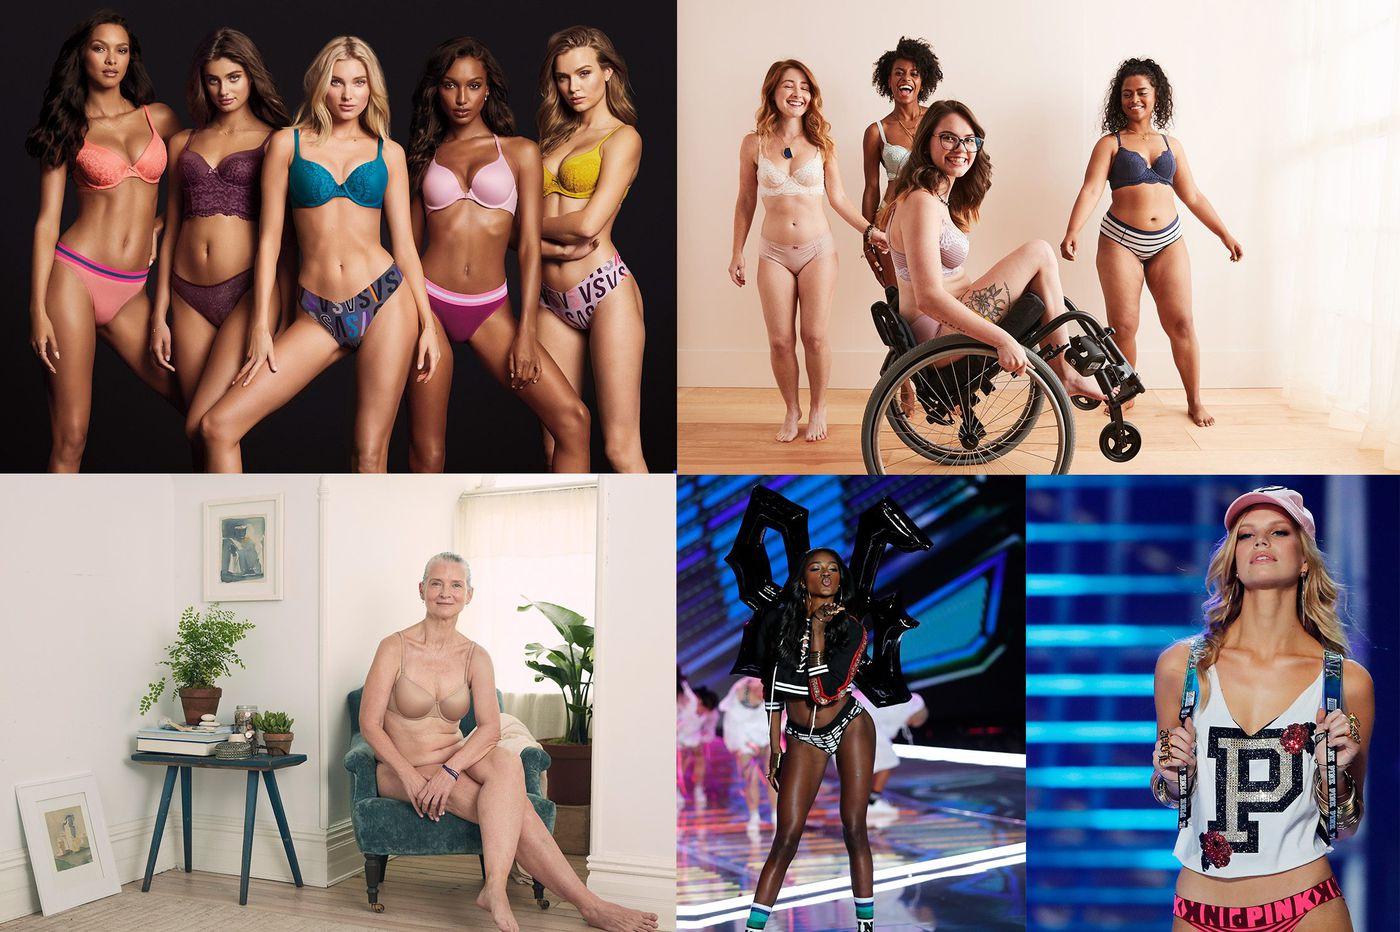 Lingerie leader Victoria's Secret has new competition: Brands embracing body positivity